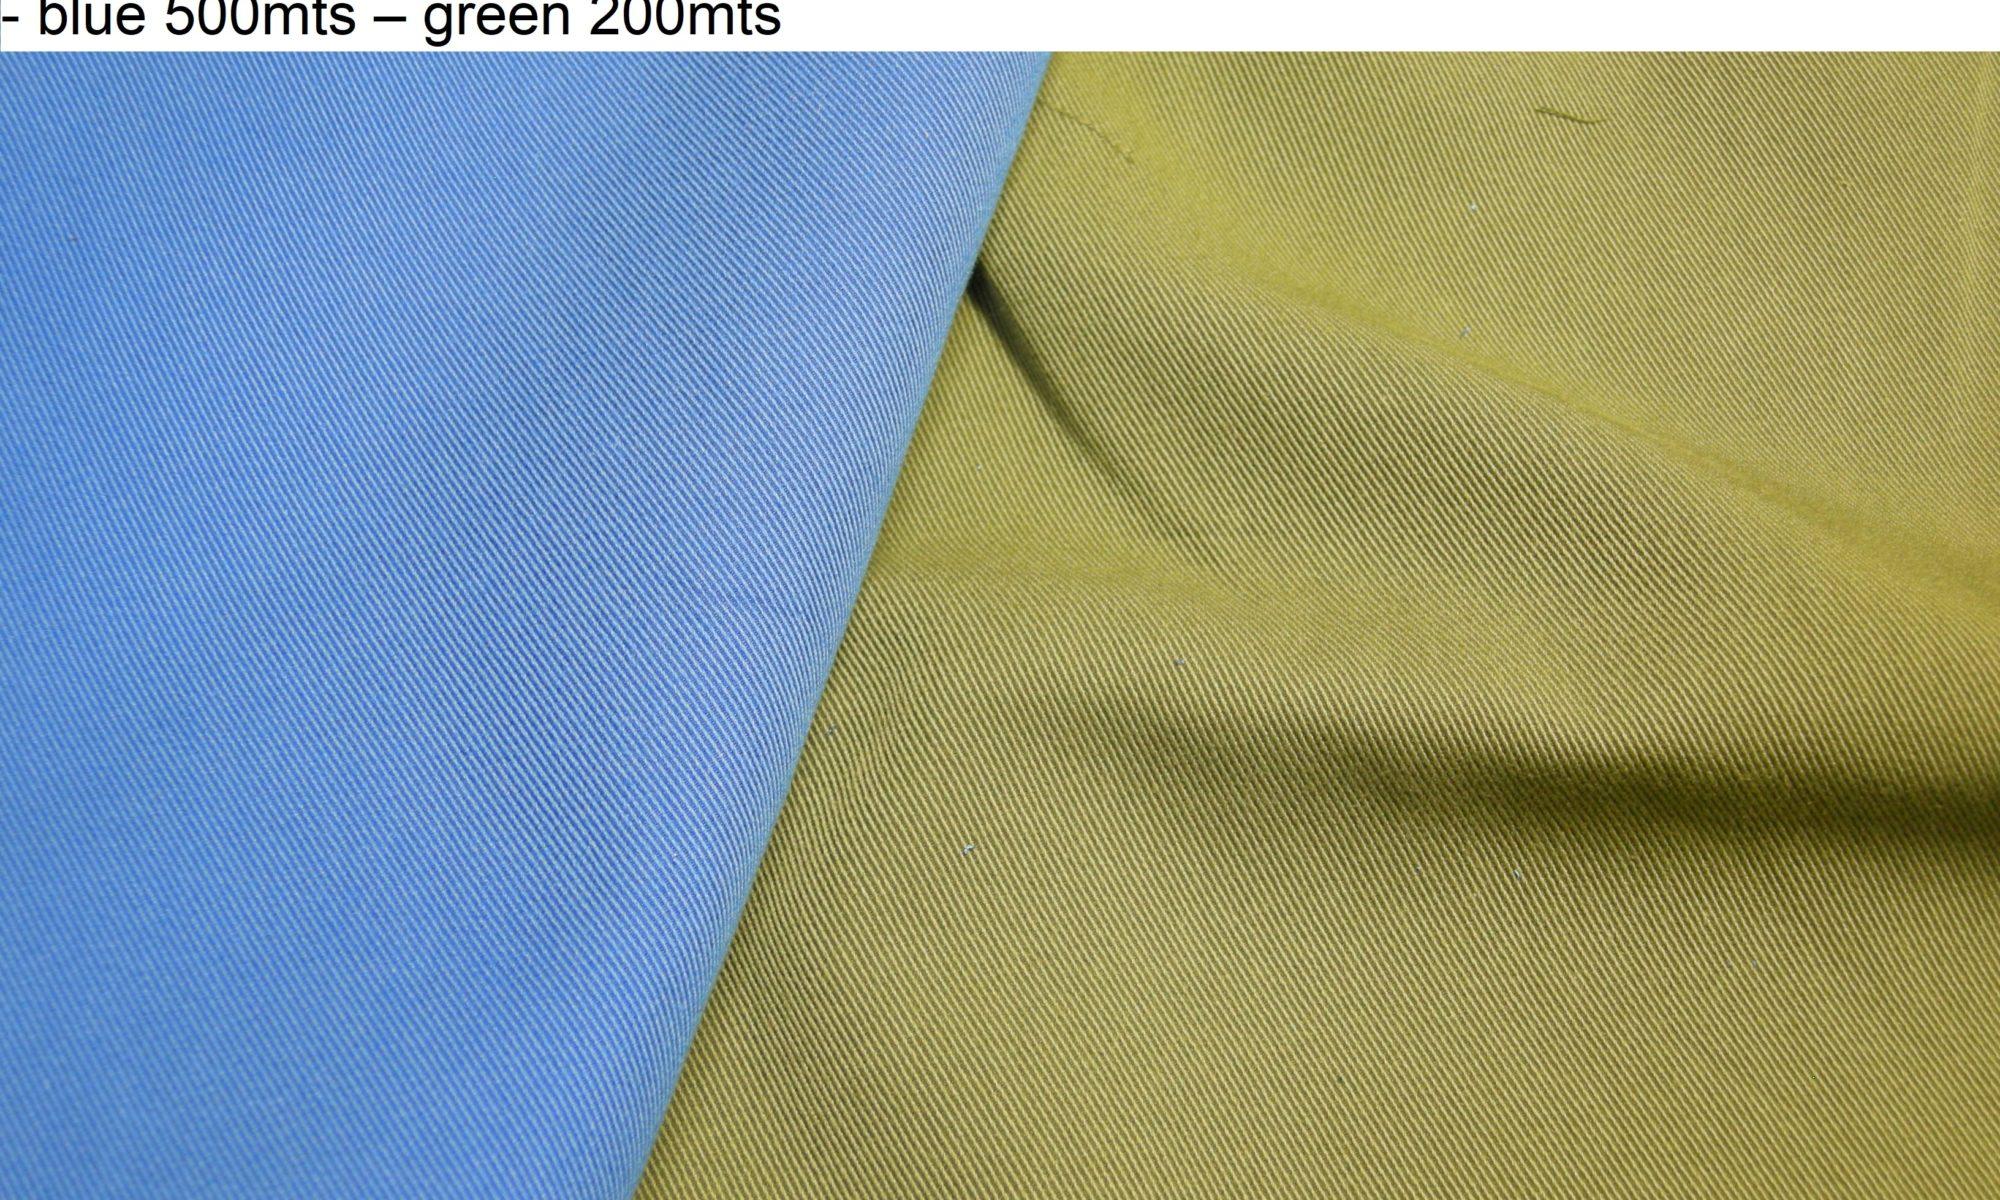 ART 7420 tencel blend rib twill jacket pants fashion fabric WIDTH cm150 WEIGHT gr370 - gr246 square meter - COMPOSITION 56 cotton 44 tencel - blue 500mts – green 200mts